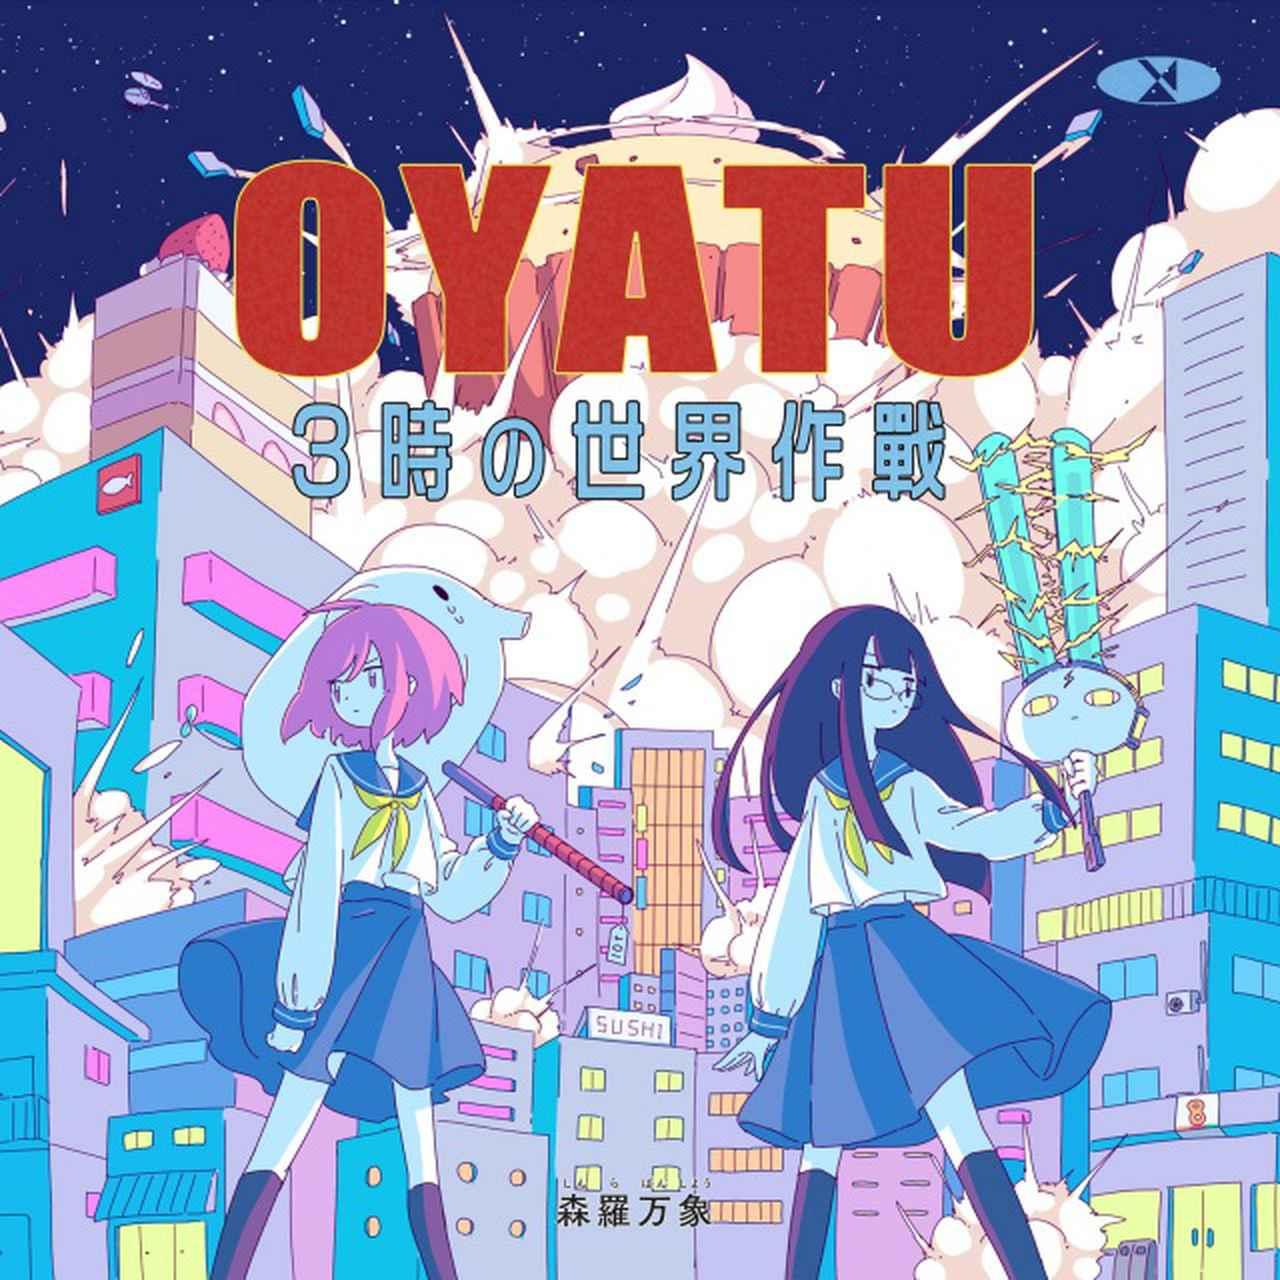 画像: OYATU 3時の世界作戦 / 森羅万象 on OTOTOY Music Store